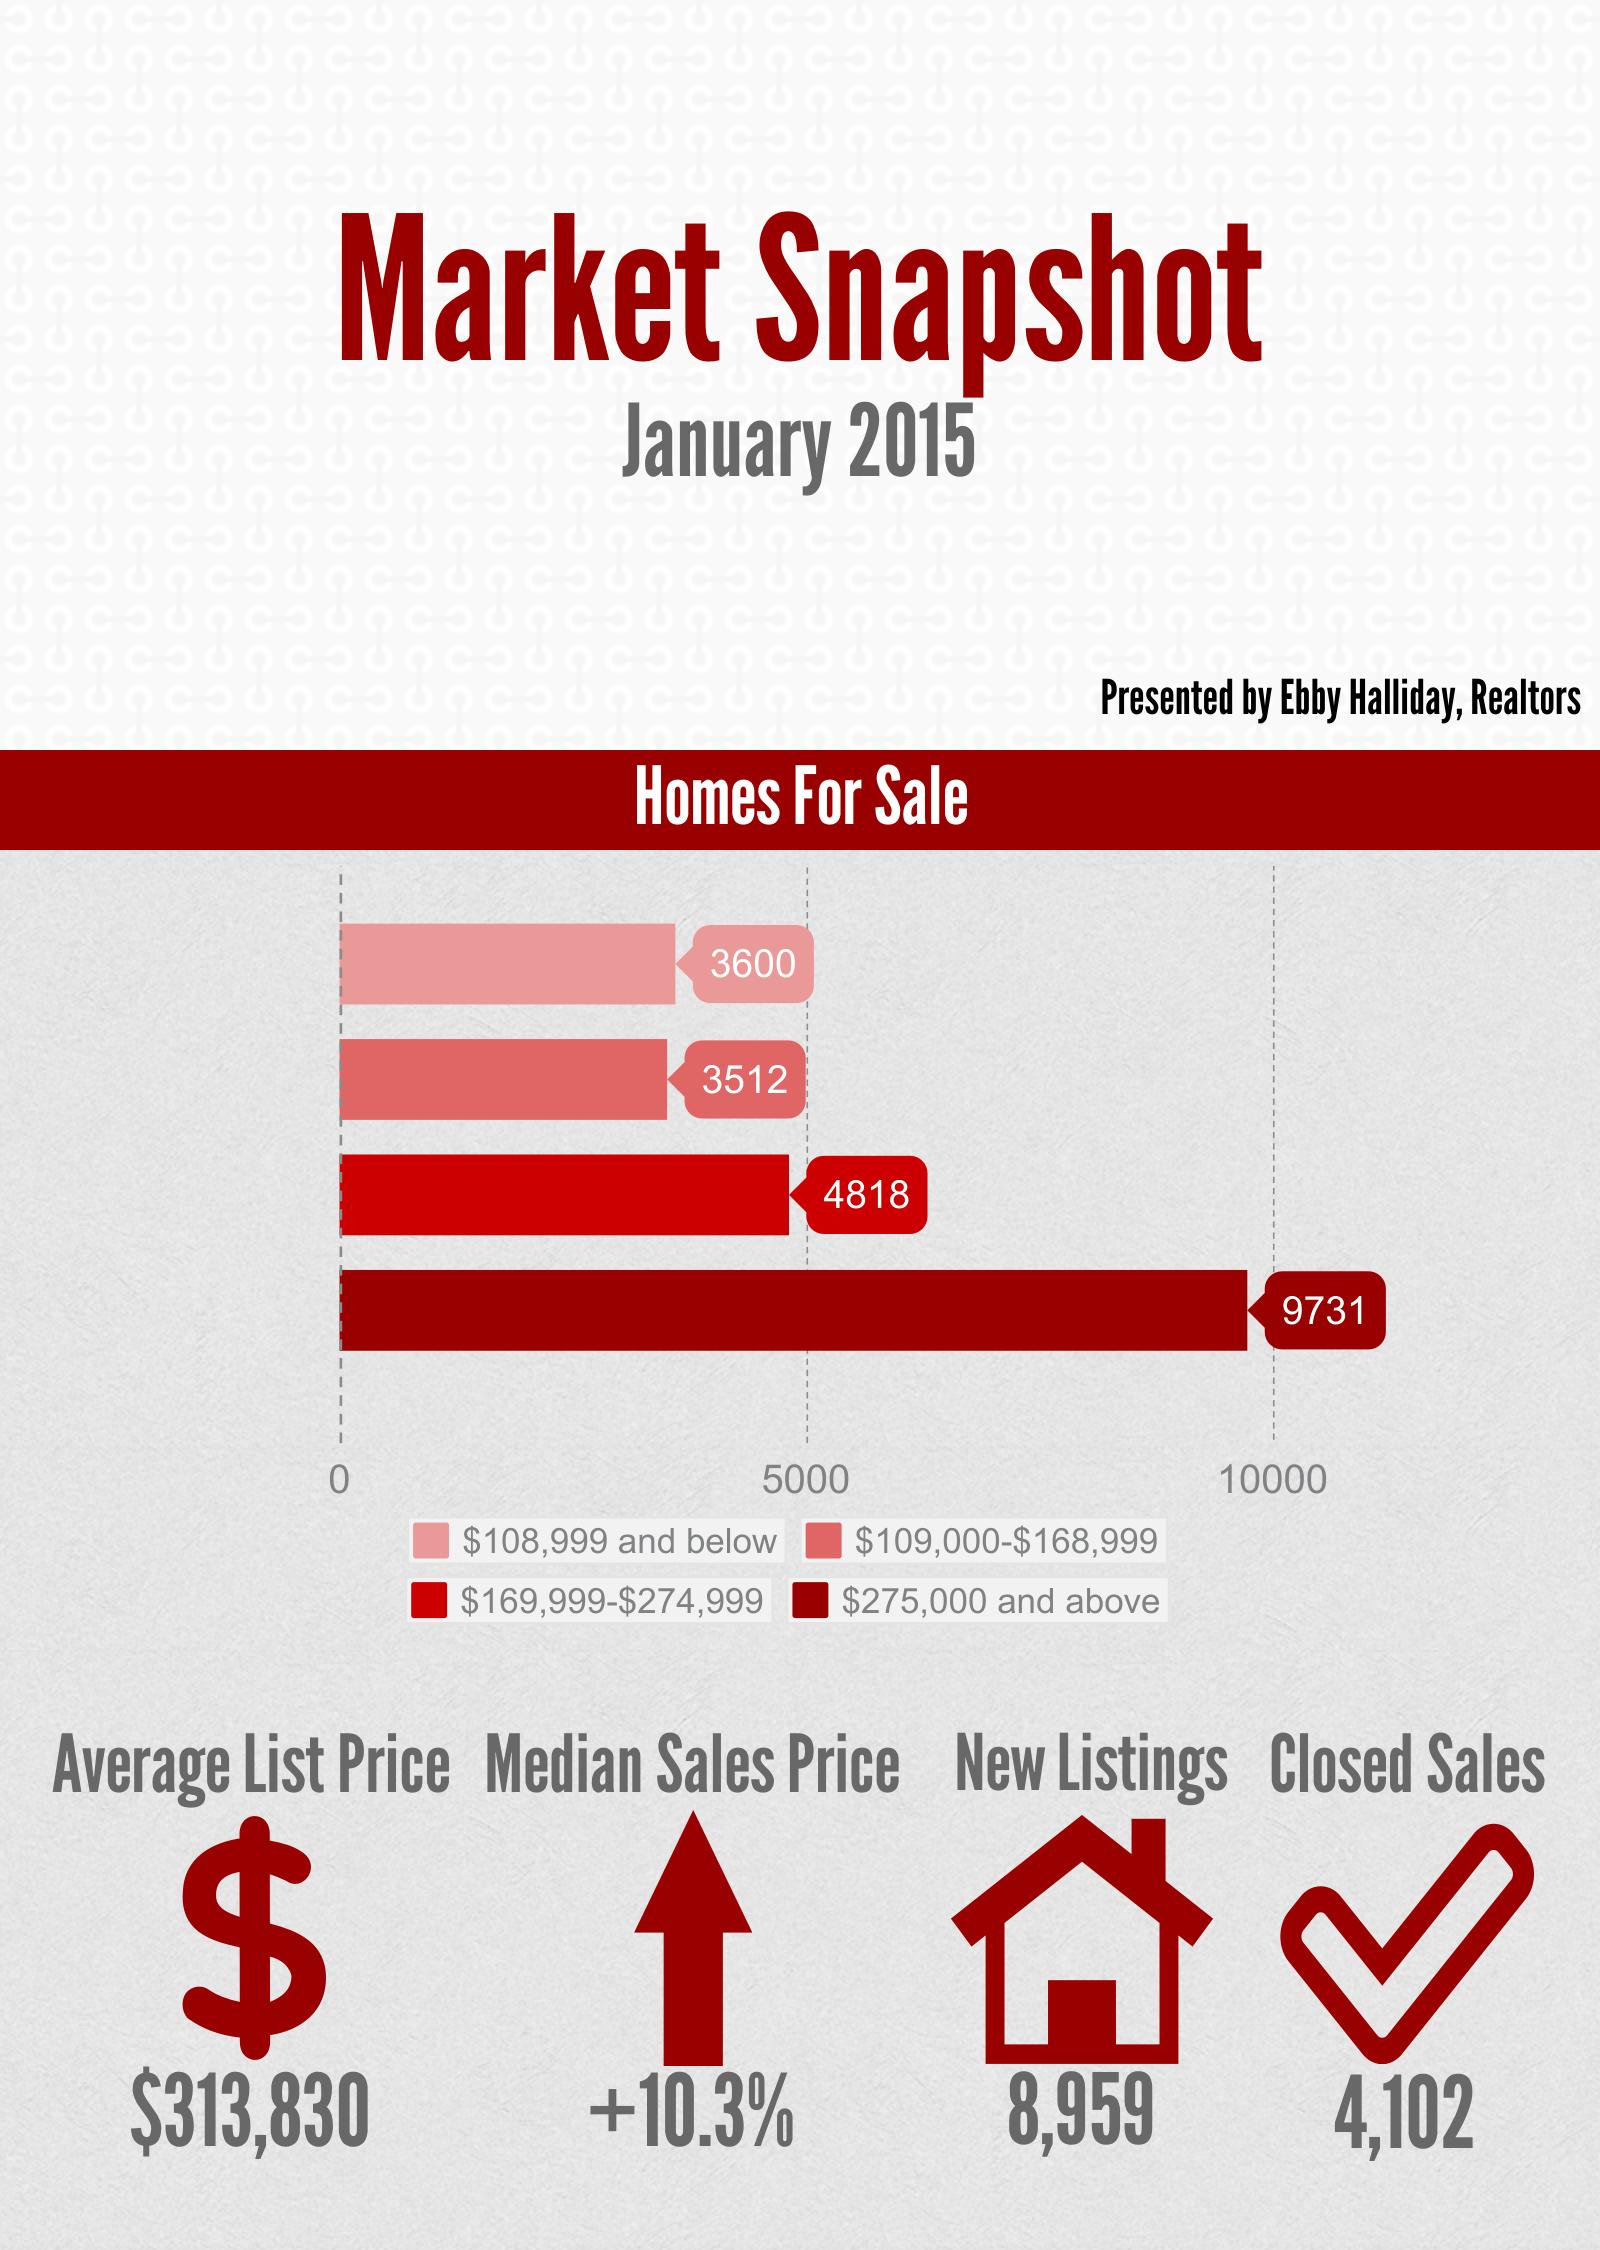 Market Snapshot January 2015